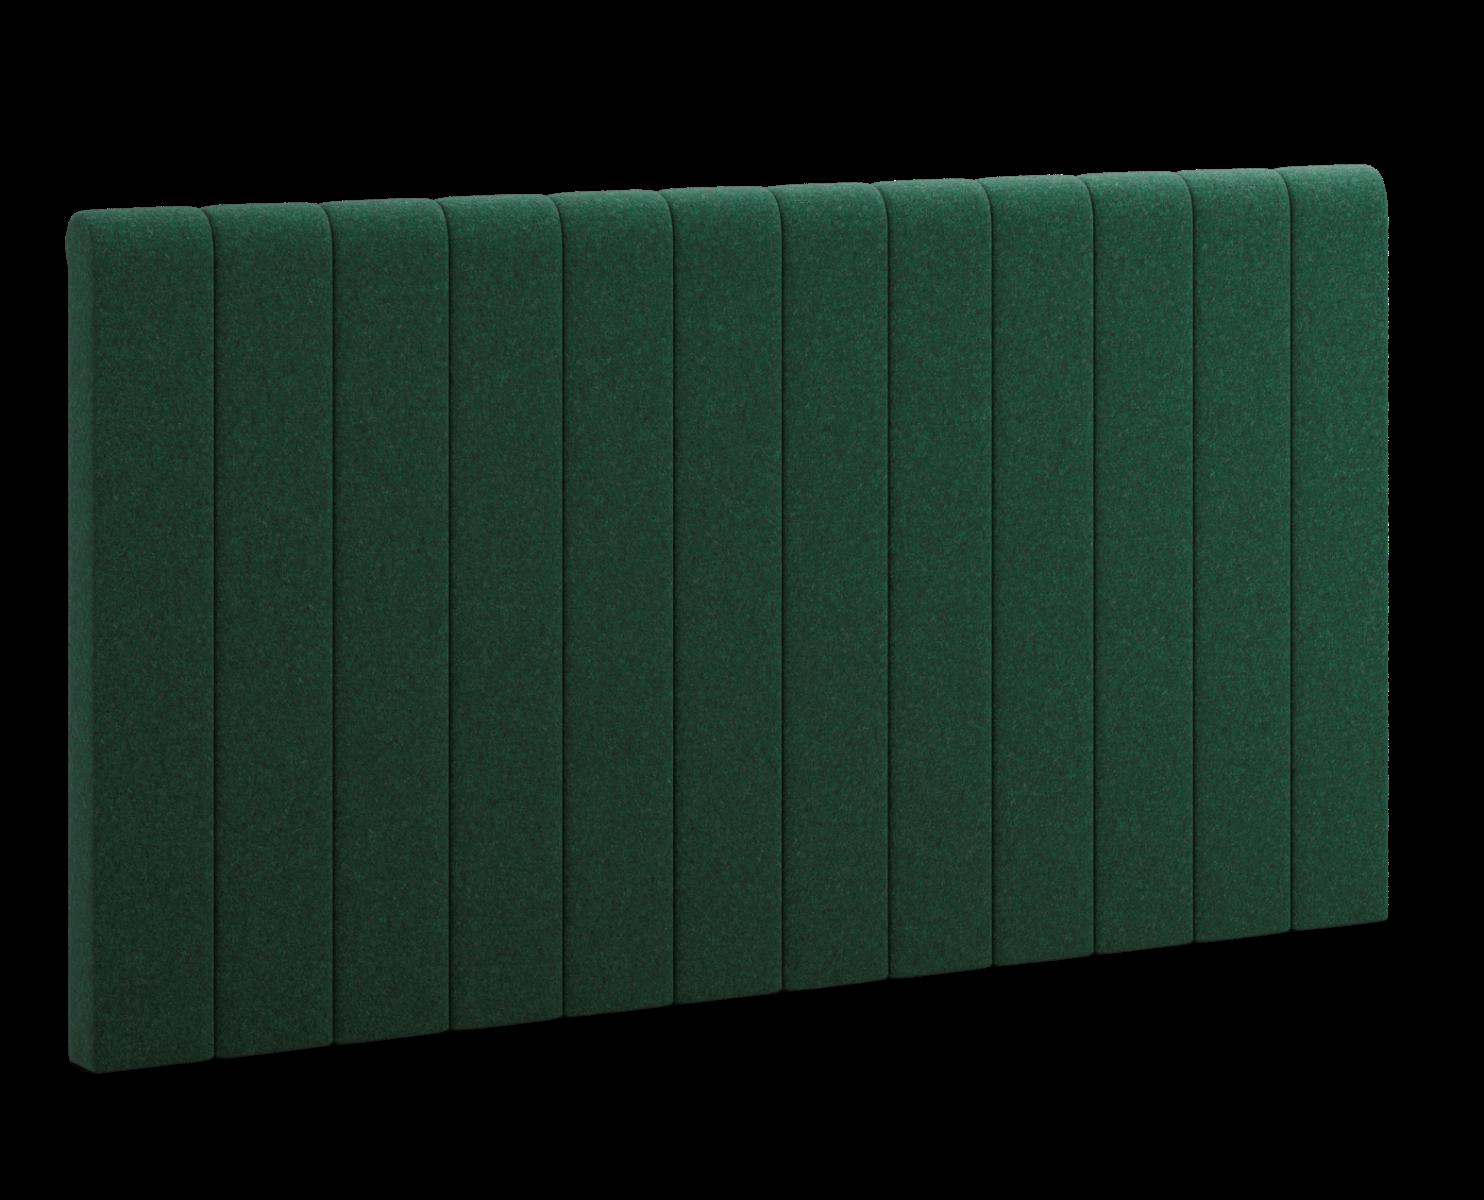 Køb Ovia Regal - 240x130x10 Grønn